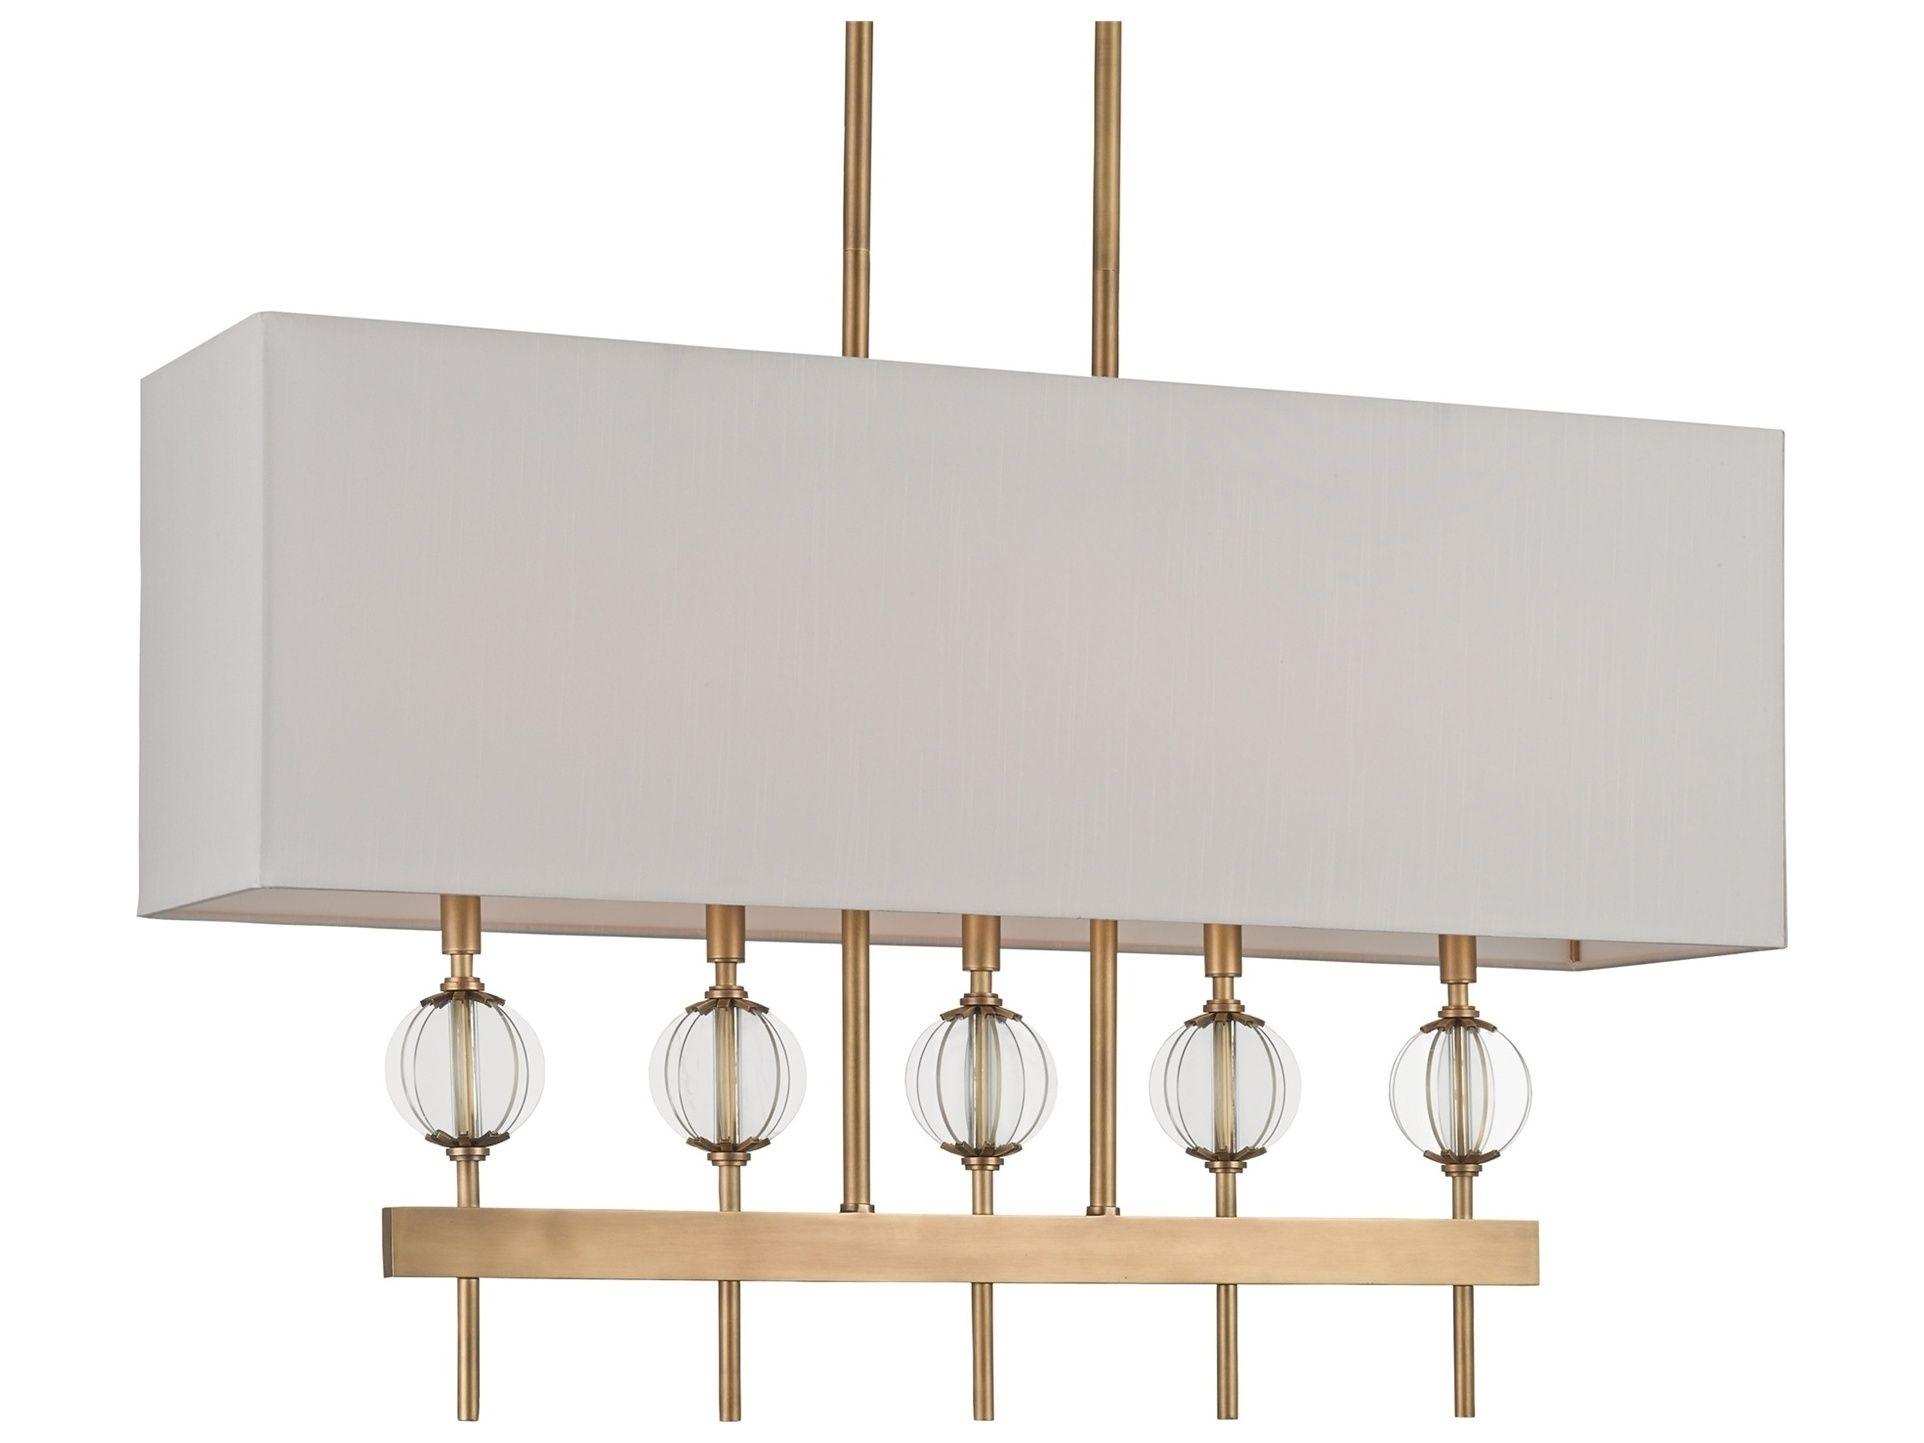 Currey & Company Highview Antique Brass 5-Light Chandelier | CY9312